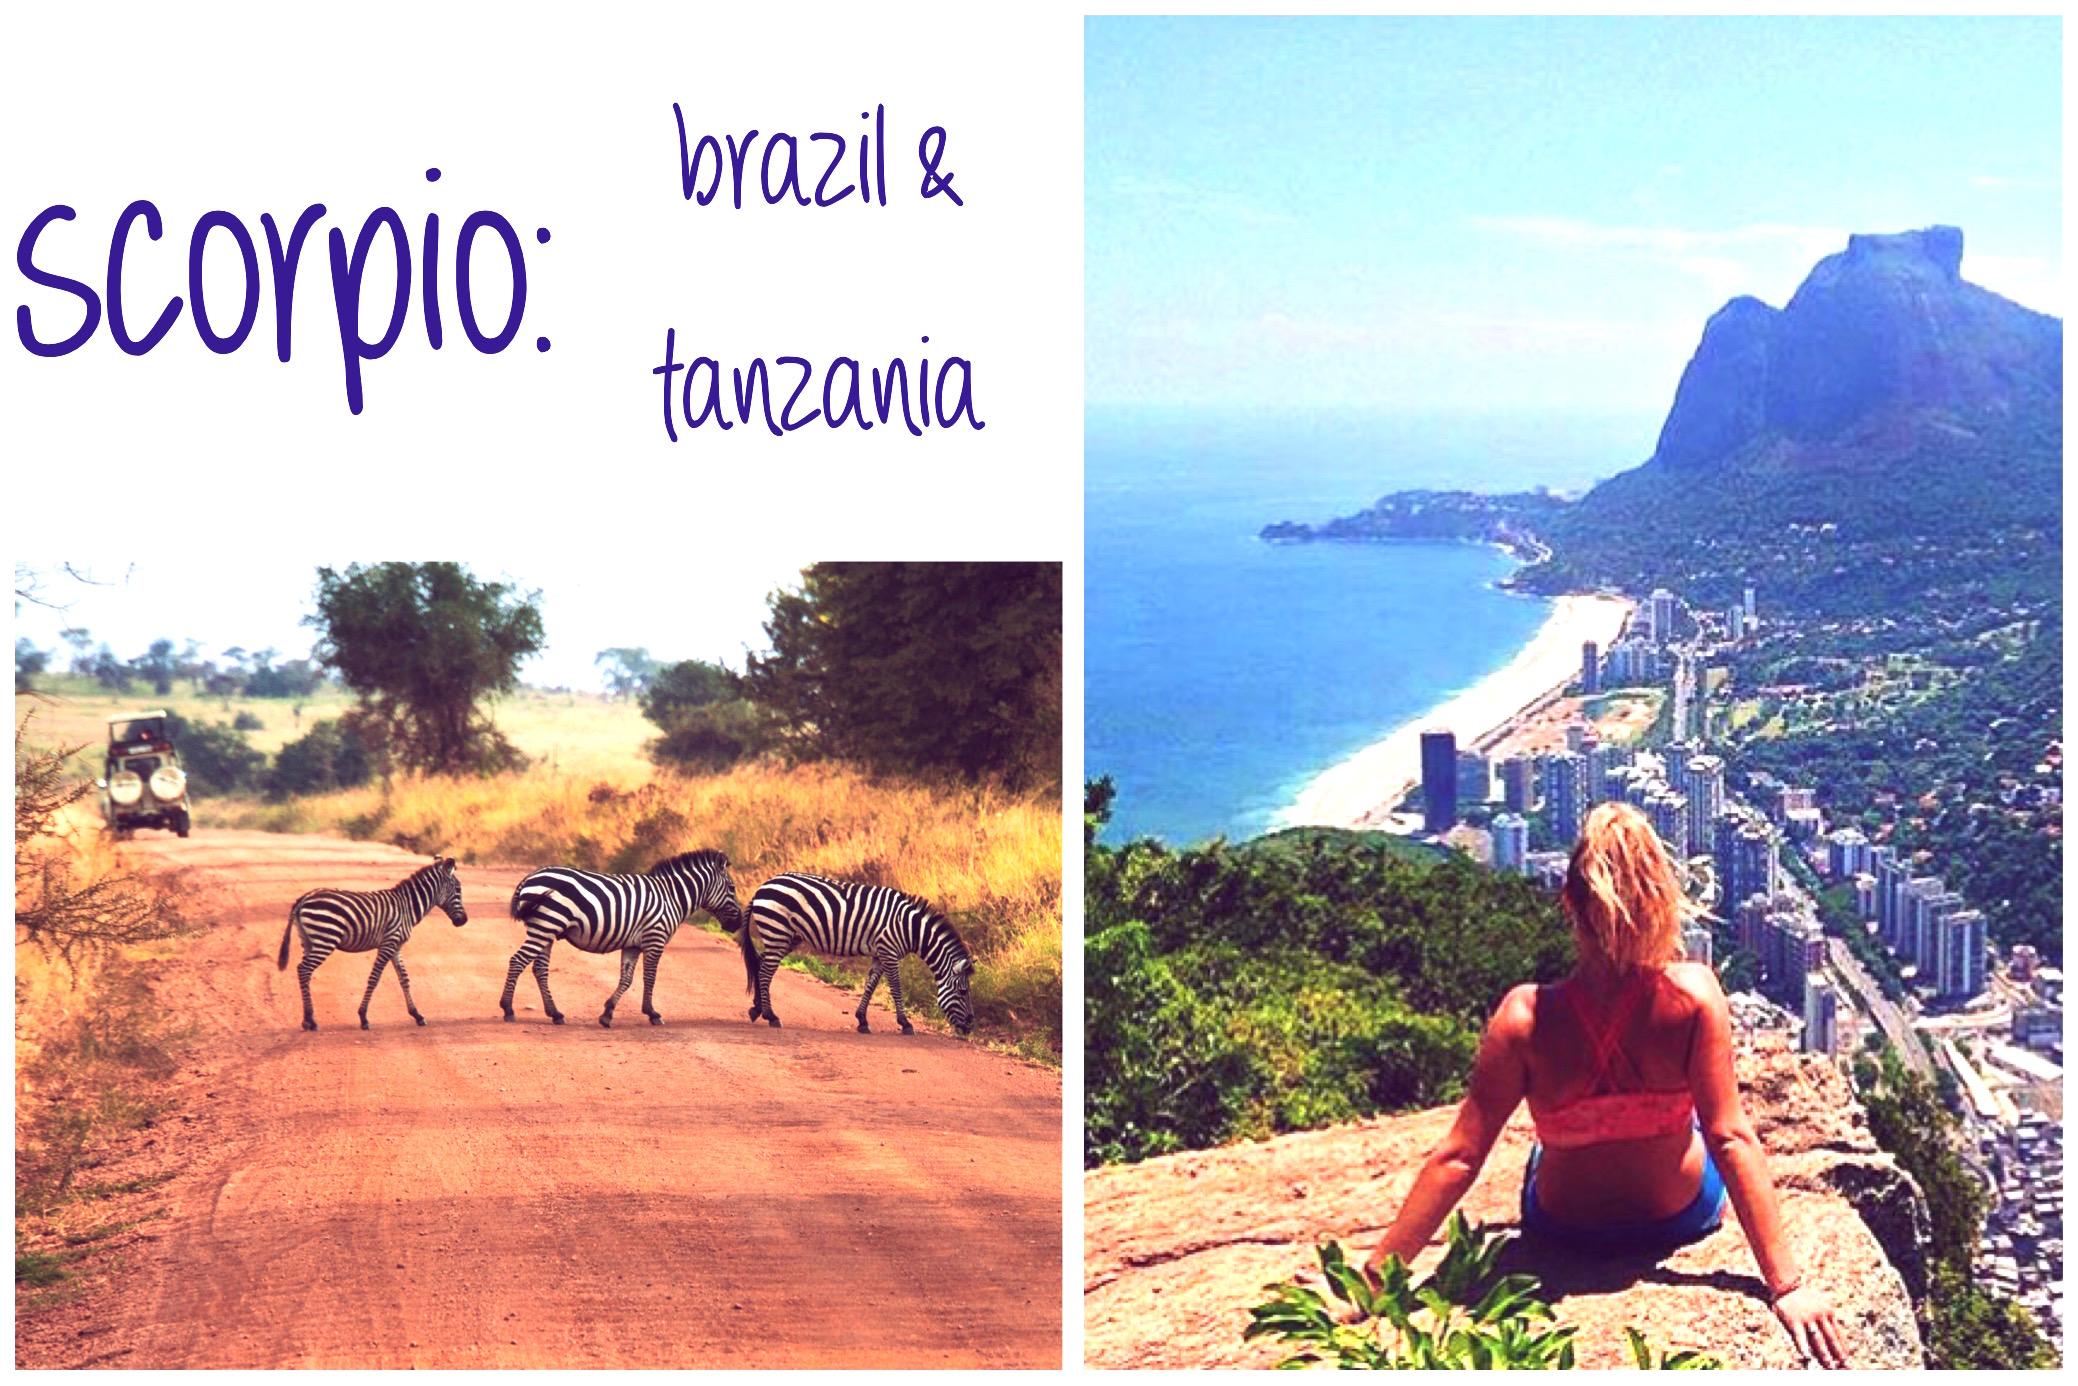 photo credit, tanzania: http://amusedobserver.com/en  // photo credit, brazil:  instagram.com/thewildwildzest